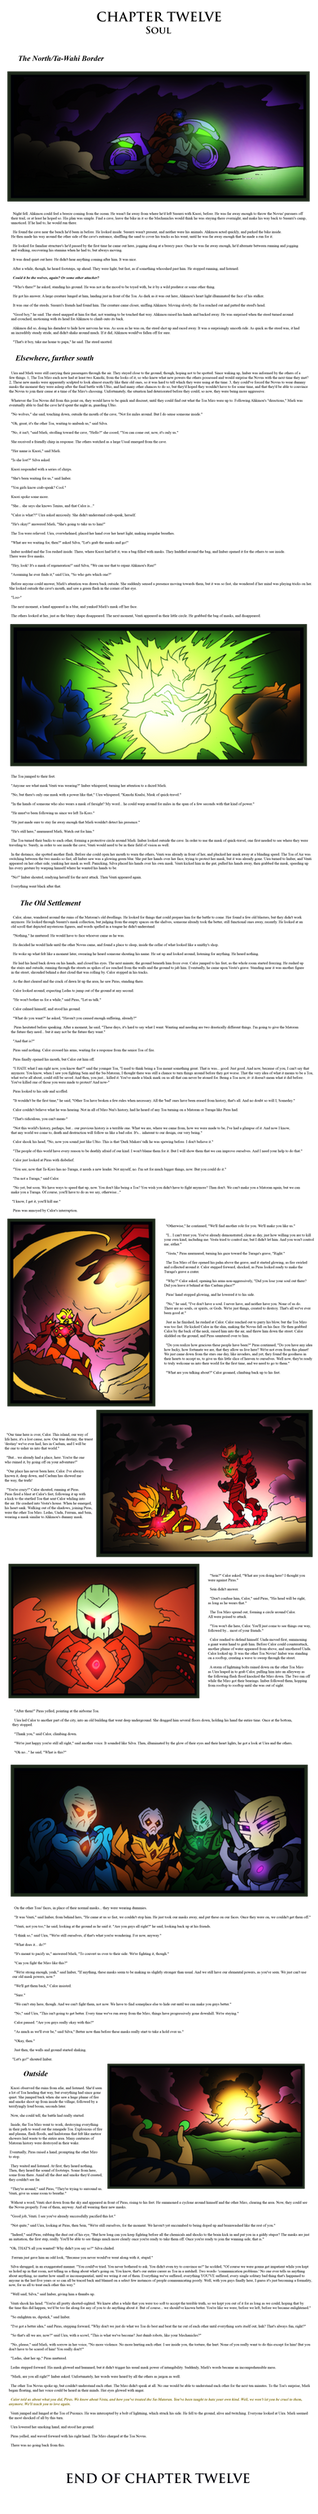 Bionicle- Nova Orbis- Return- Chapter 12